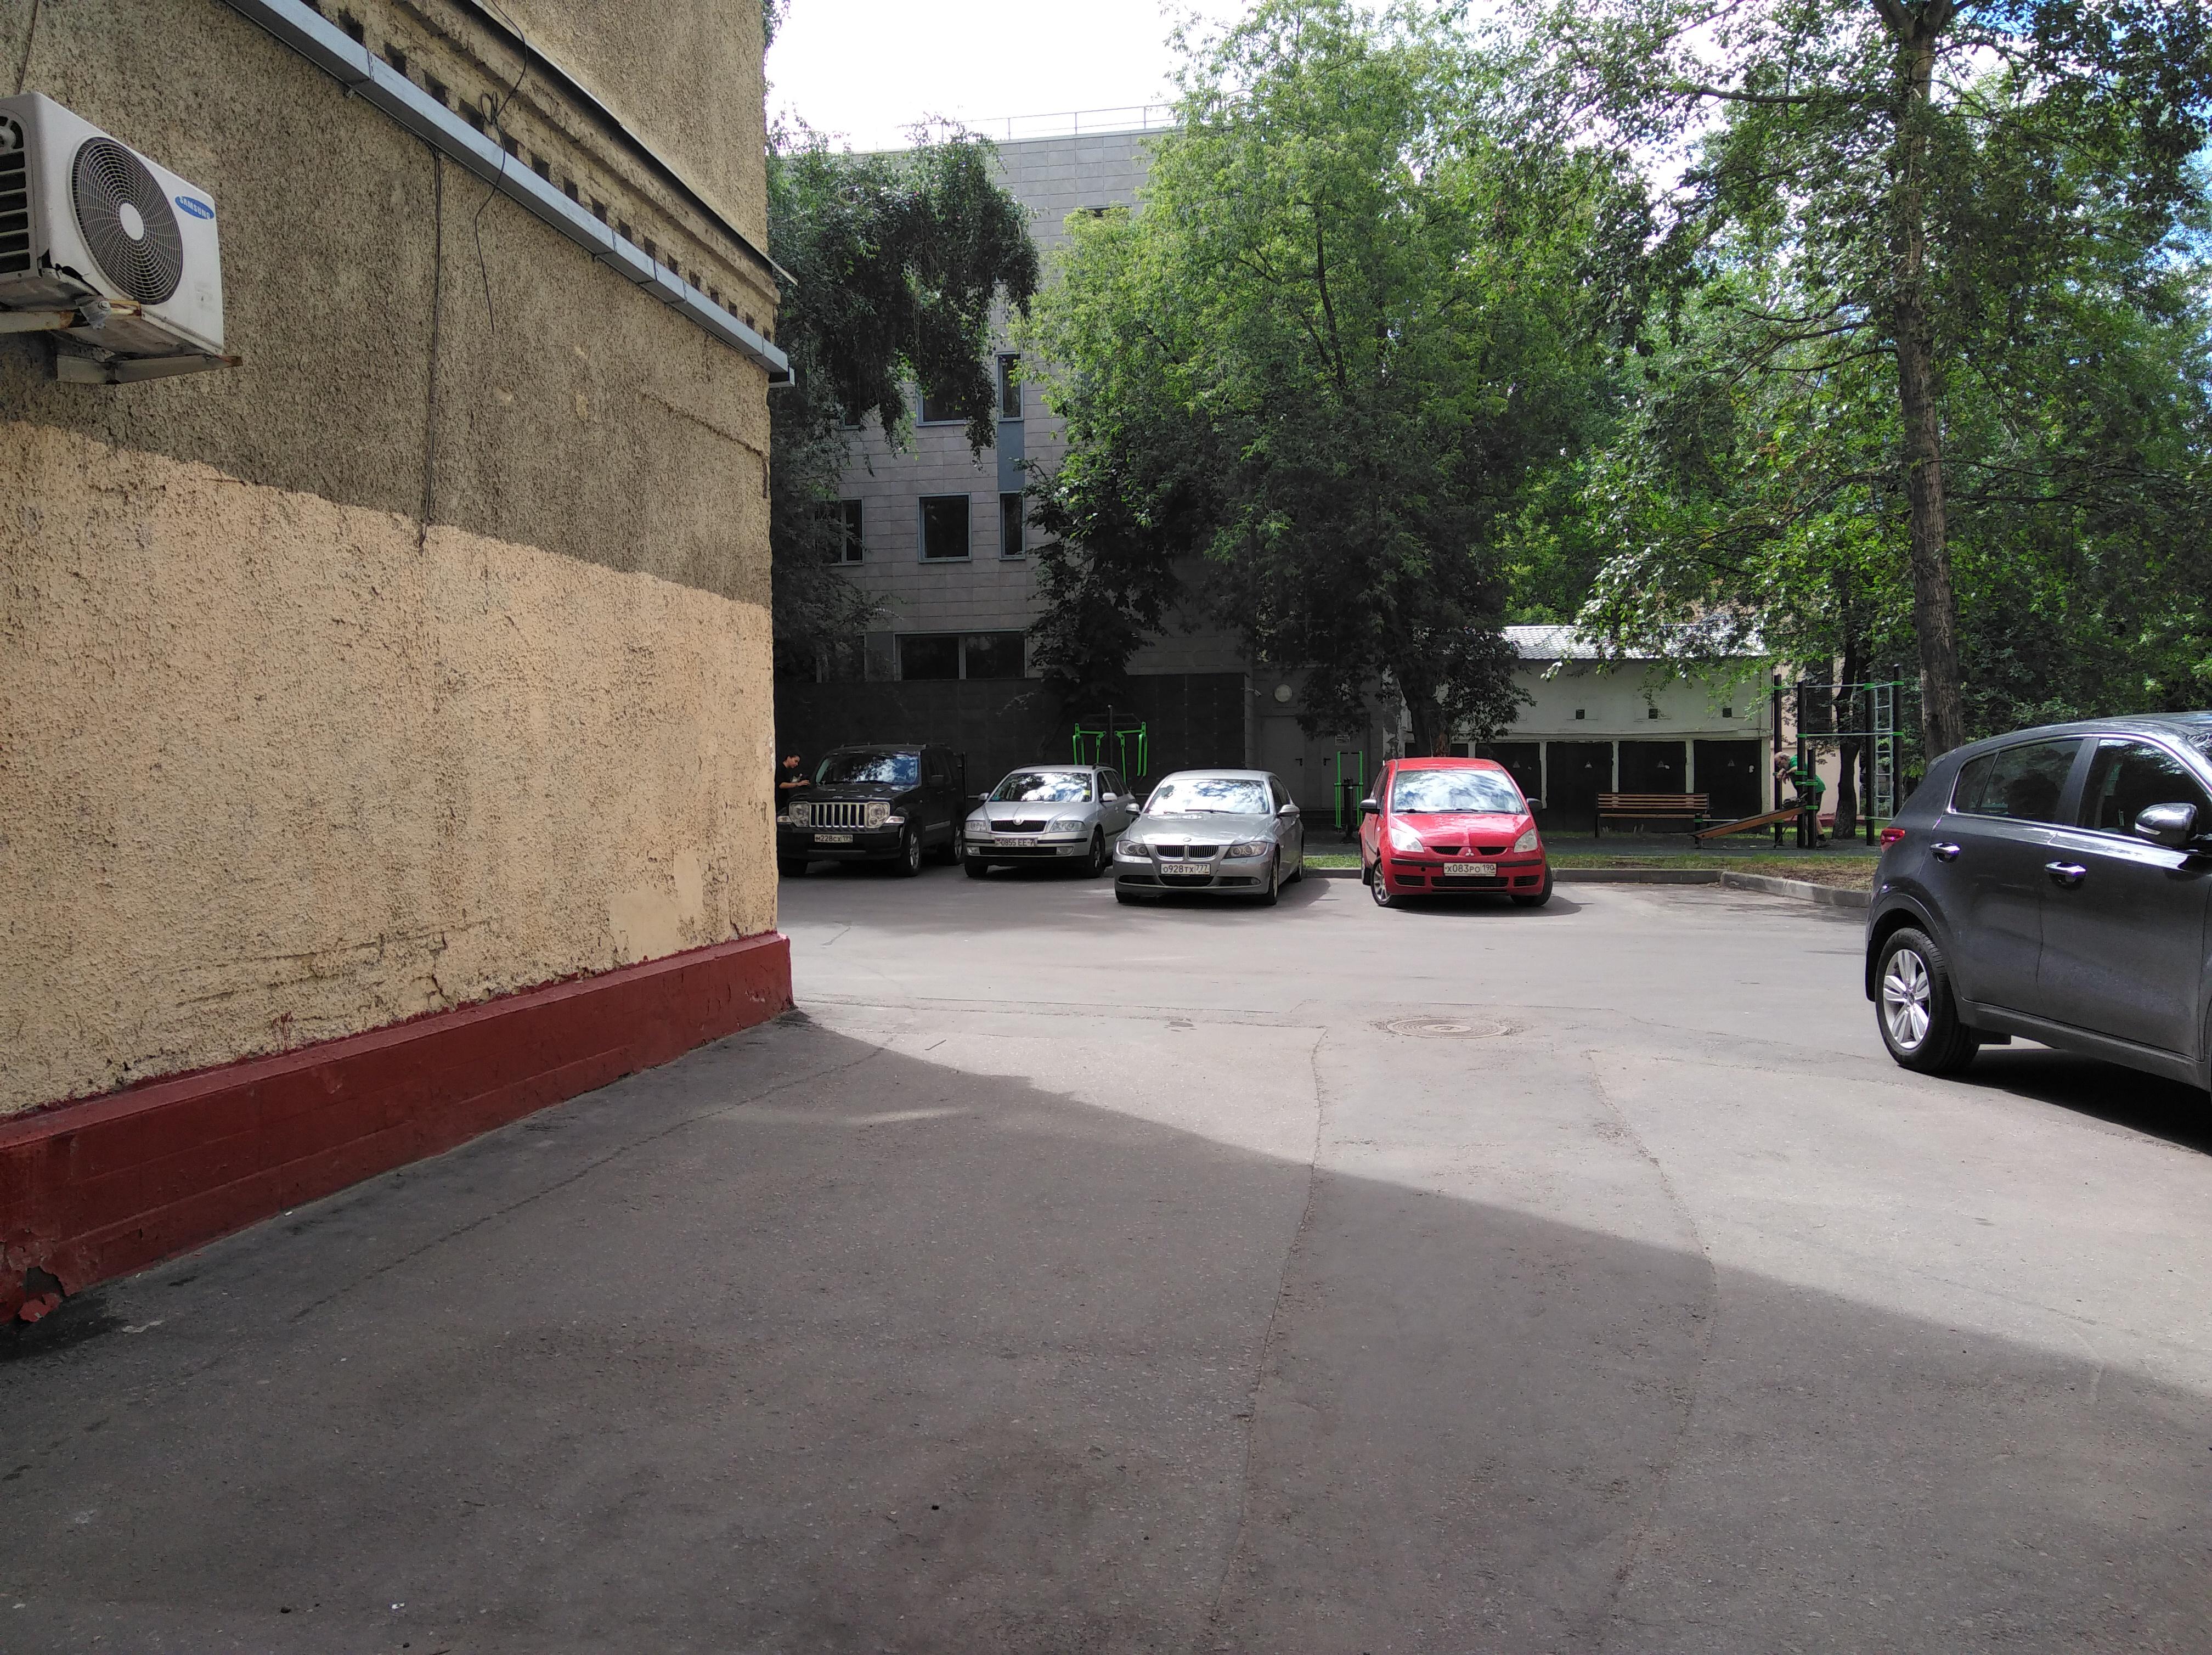 школа танцев, танцы на белорусской, кизомба белорусскаЯ, тверк белорусская, тверк на белорусской, уроки танцев белорусская